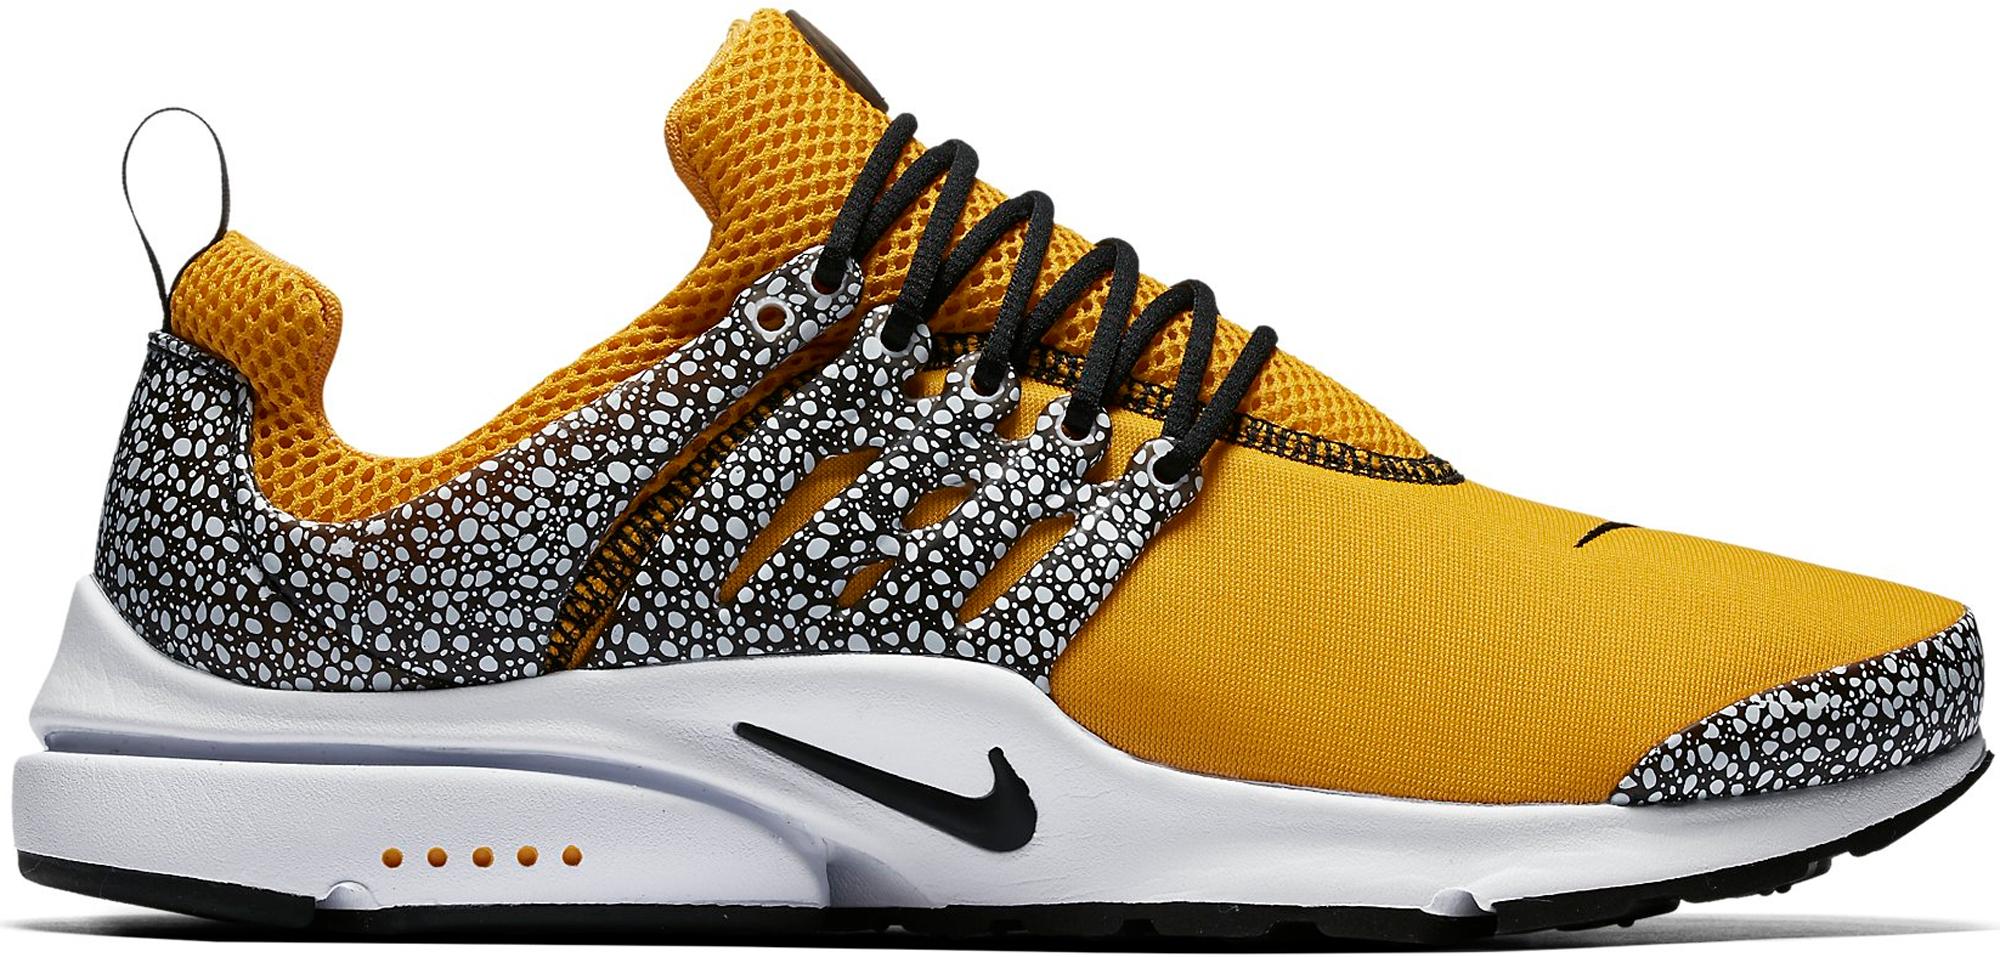 Nike Air Presto Safari Gold - 886043-700